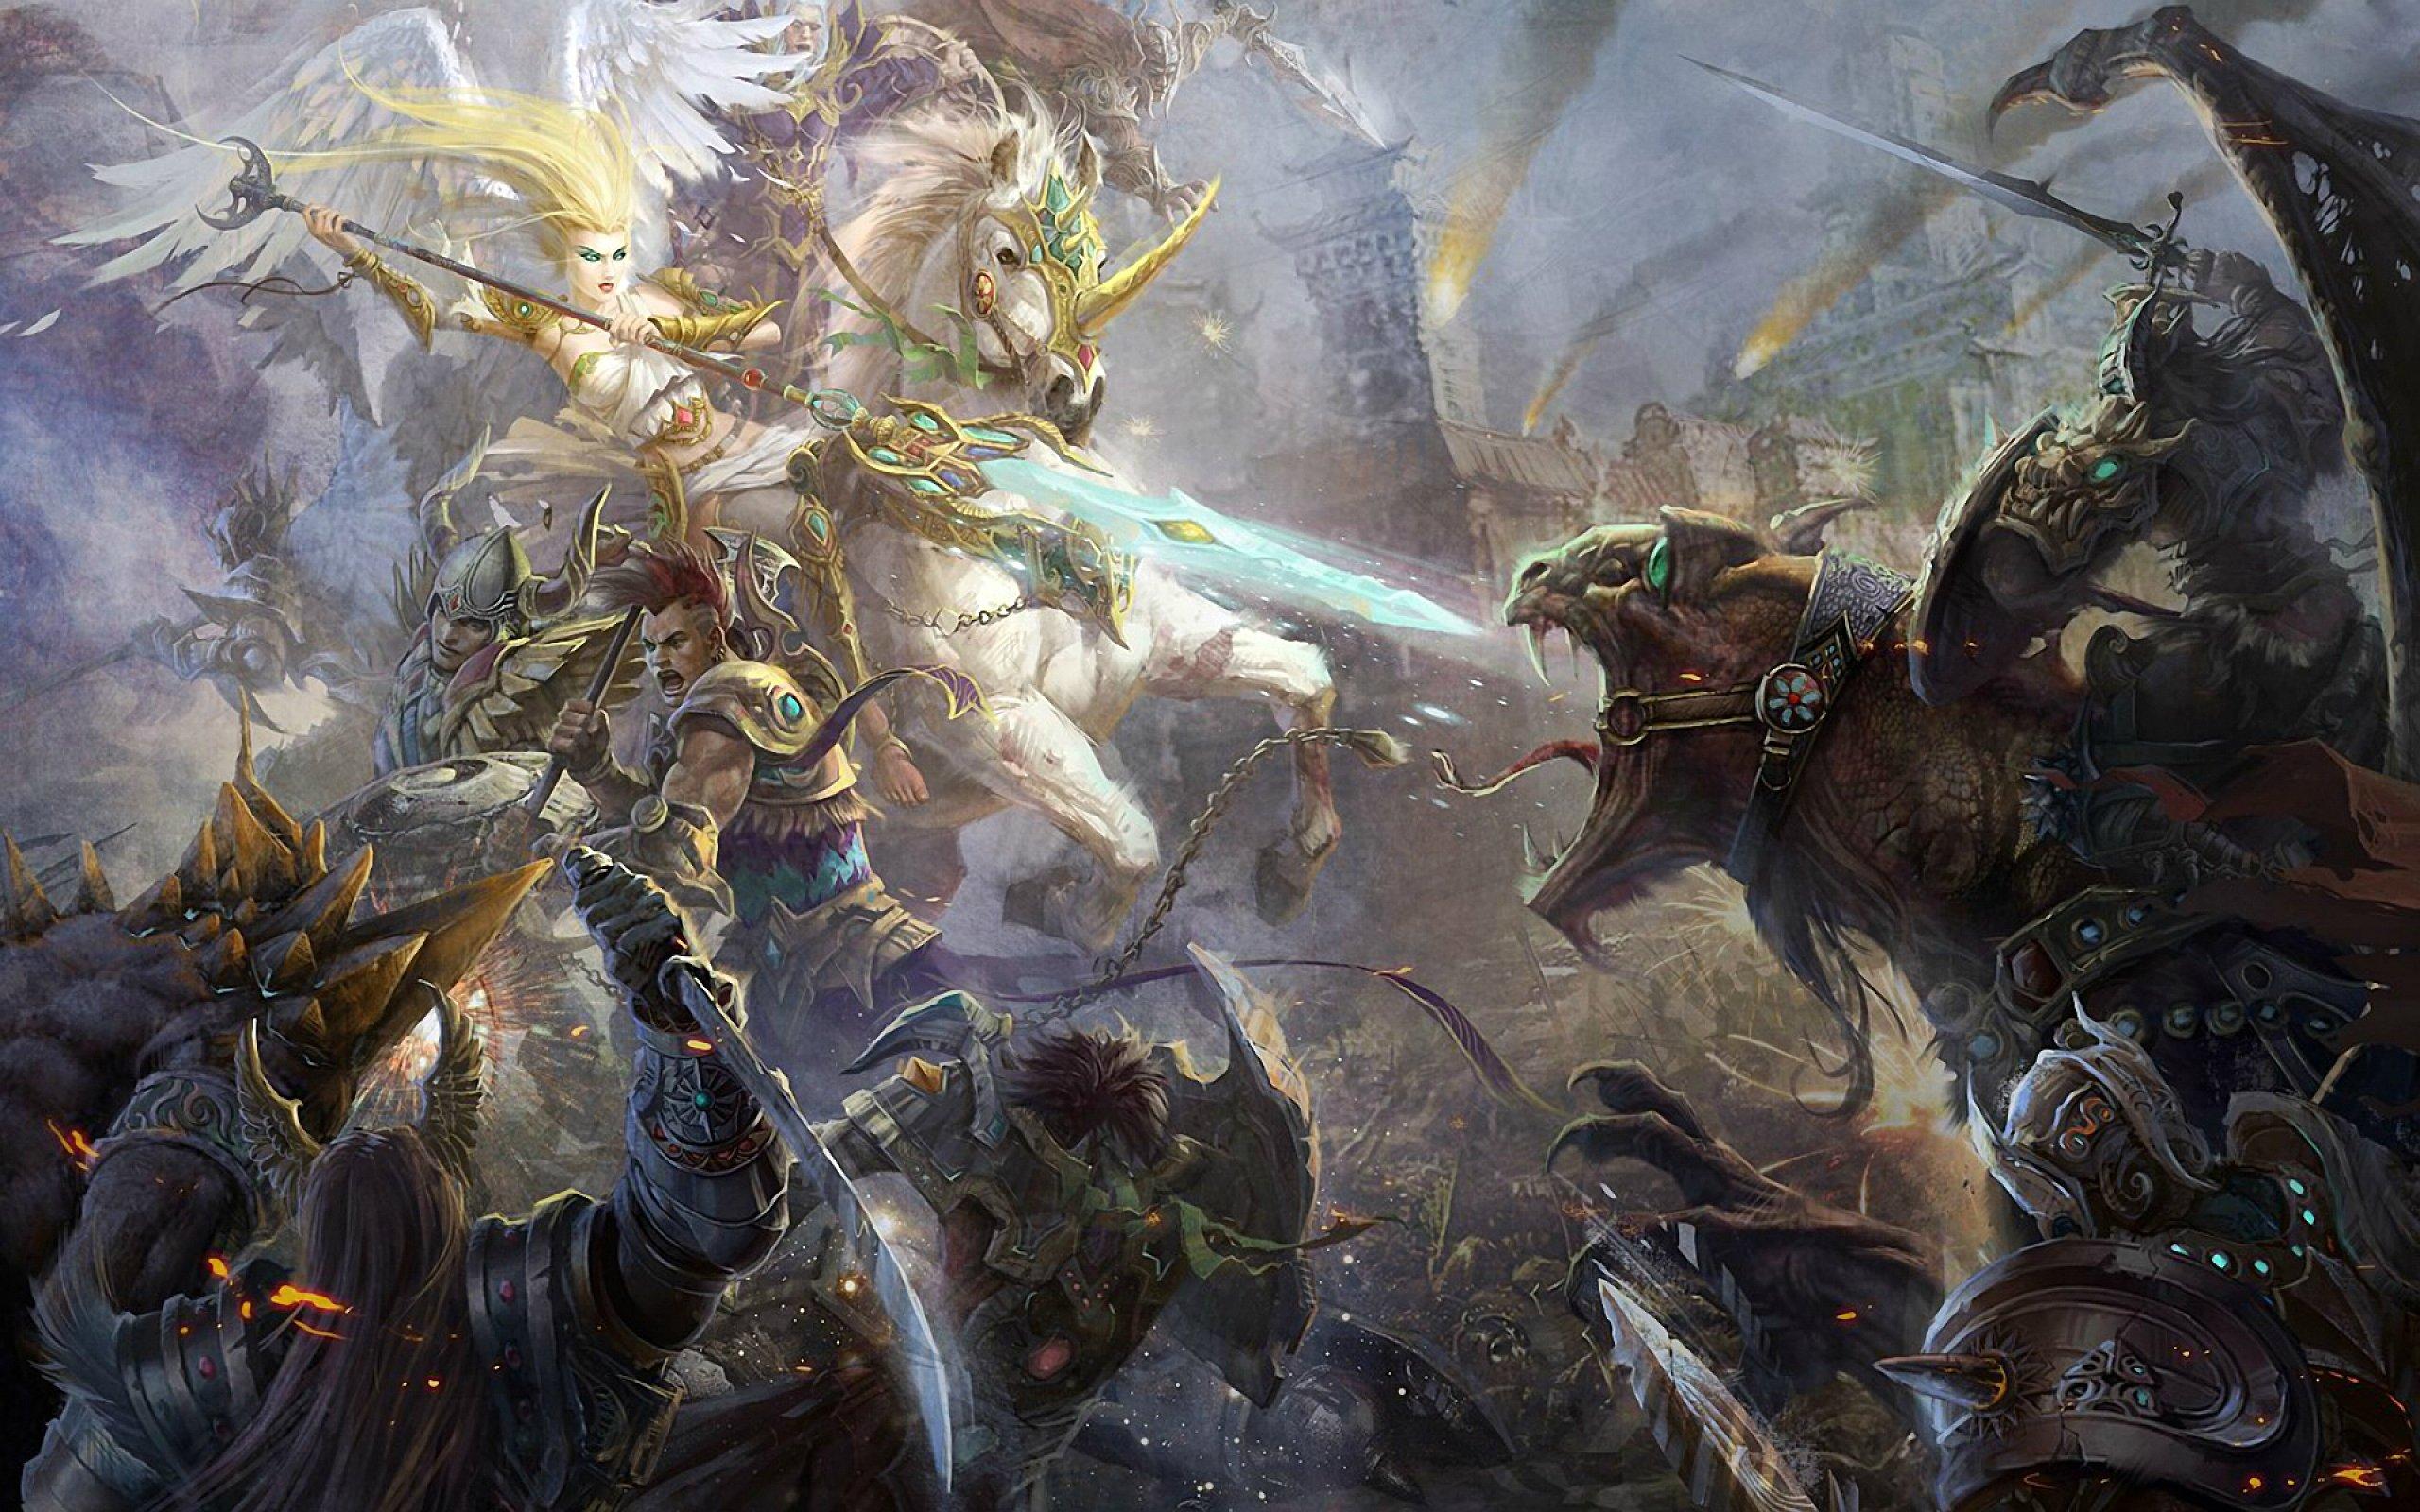 fantasy battle fighting warrior action art artwork